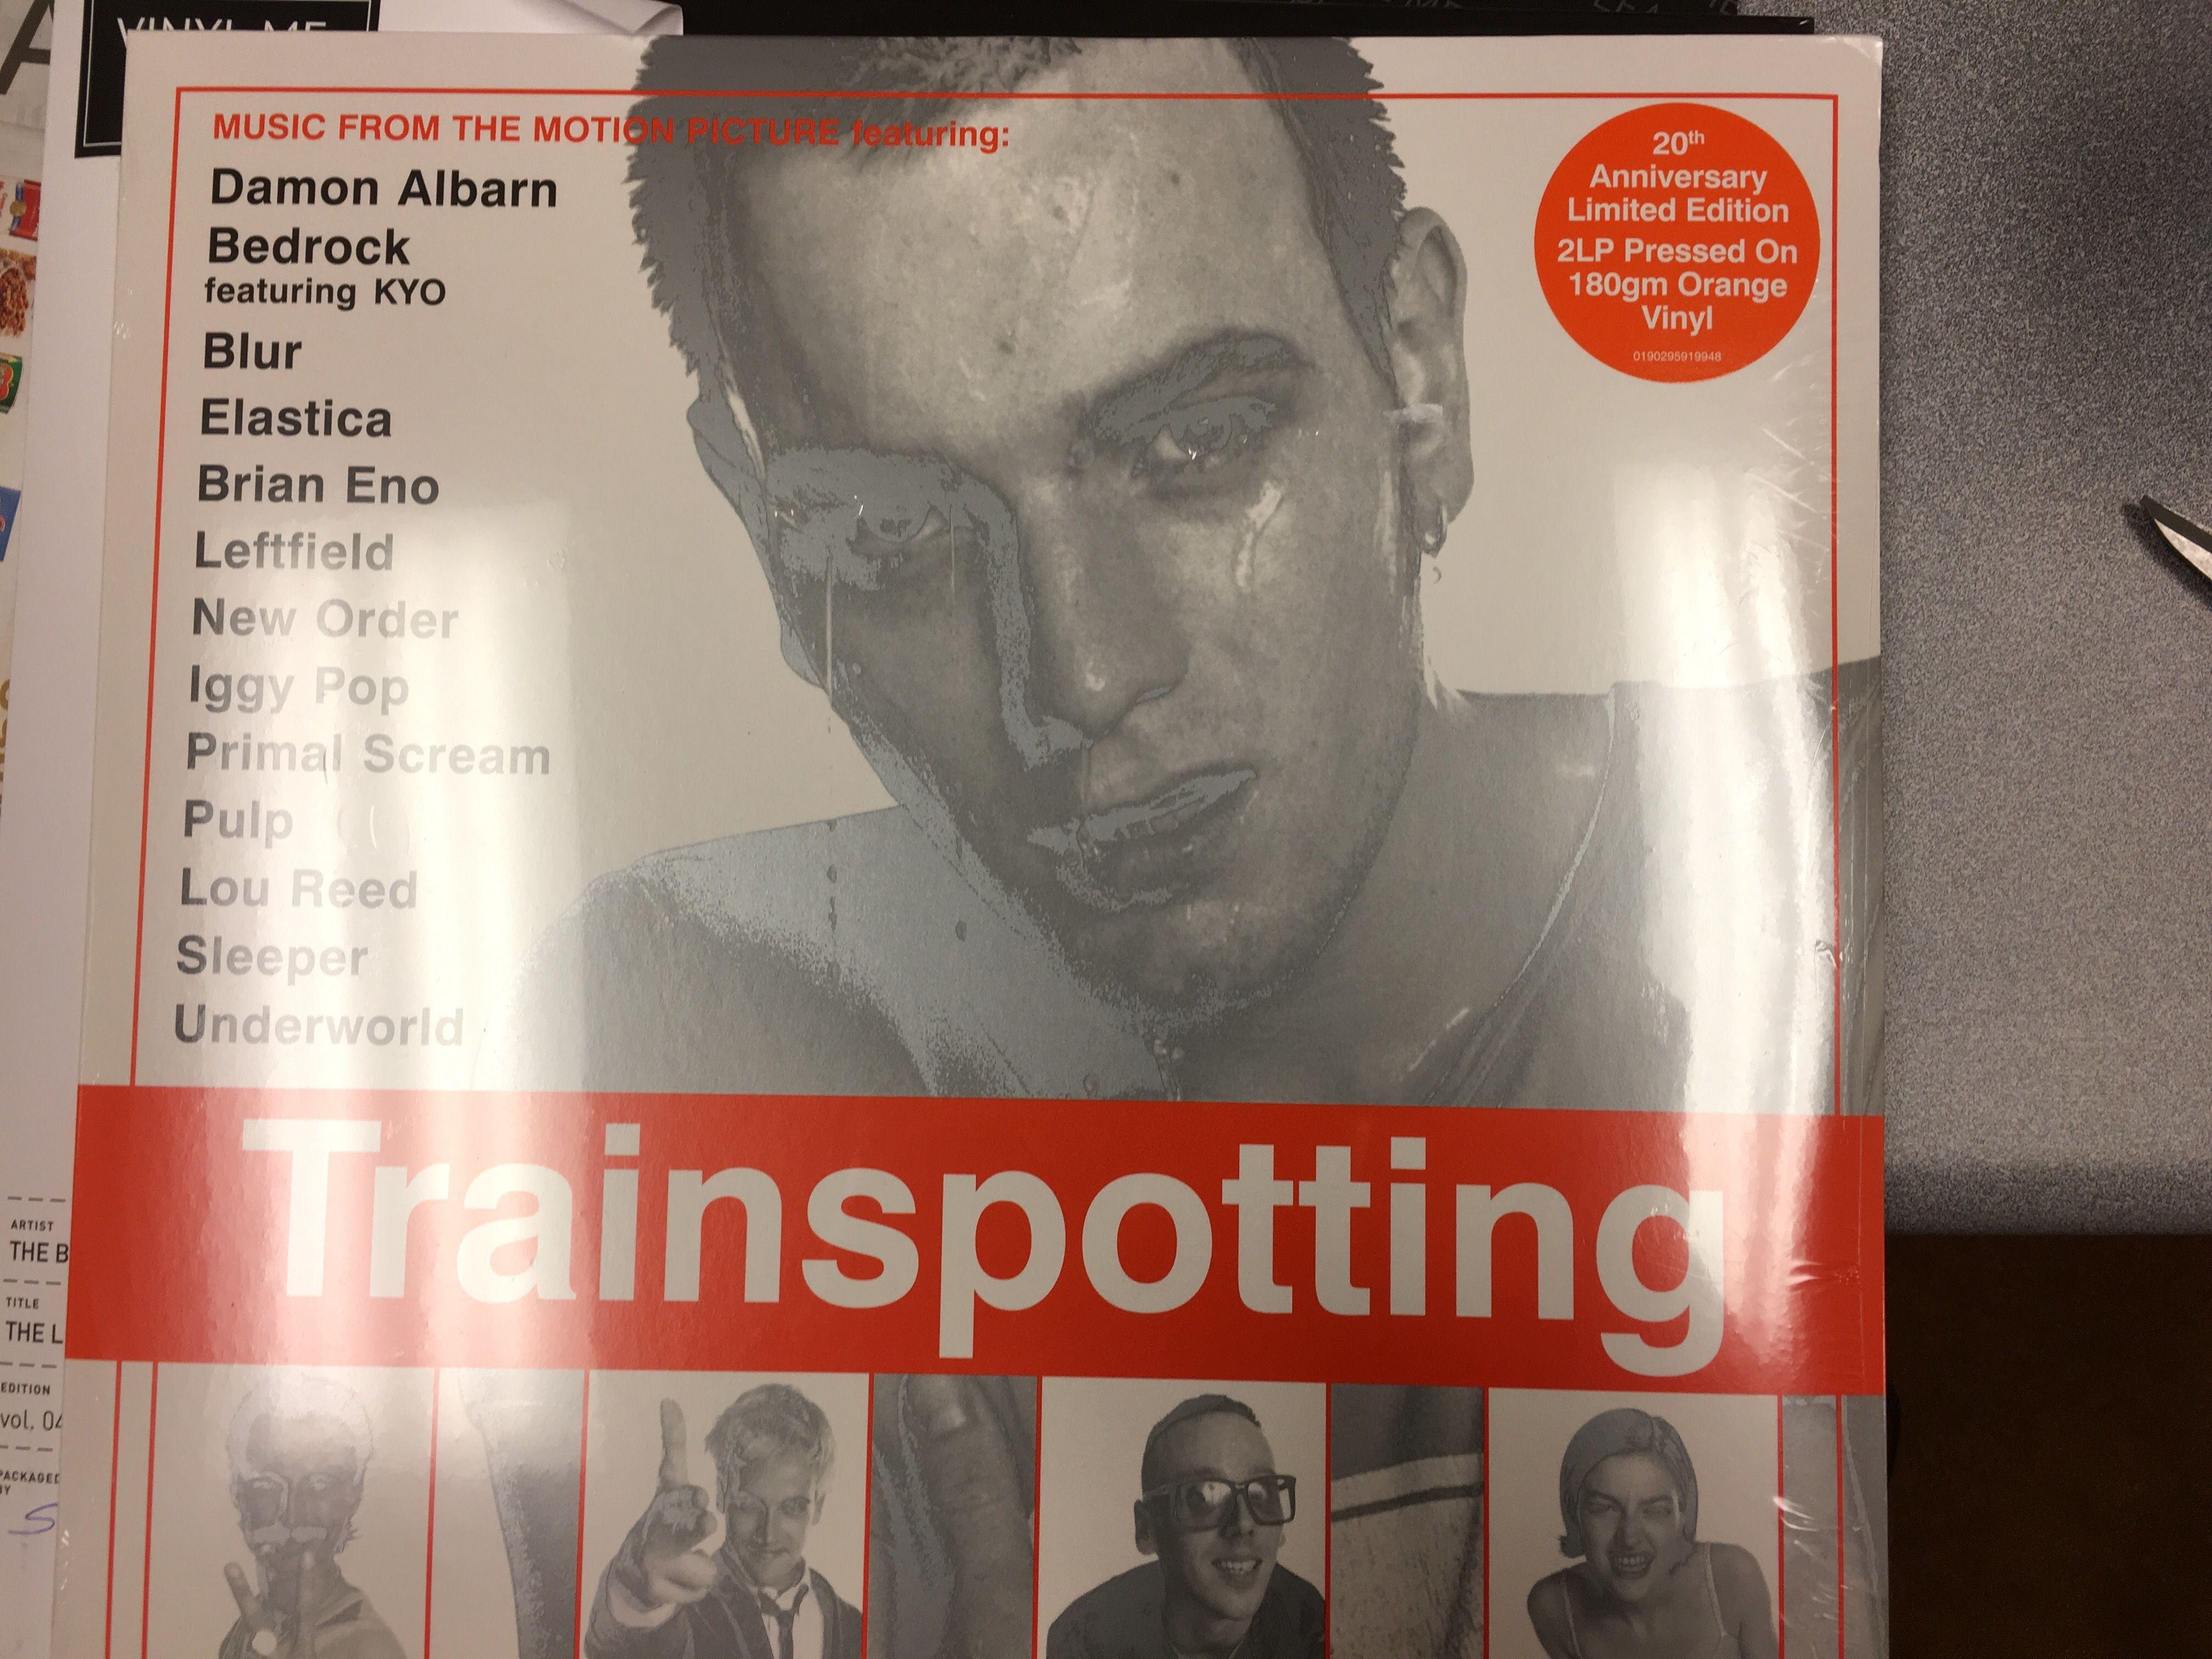 Trainspotting Soundtrack (orange vinyl)